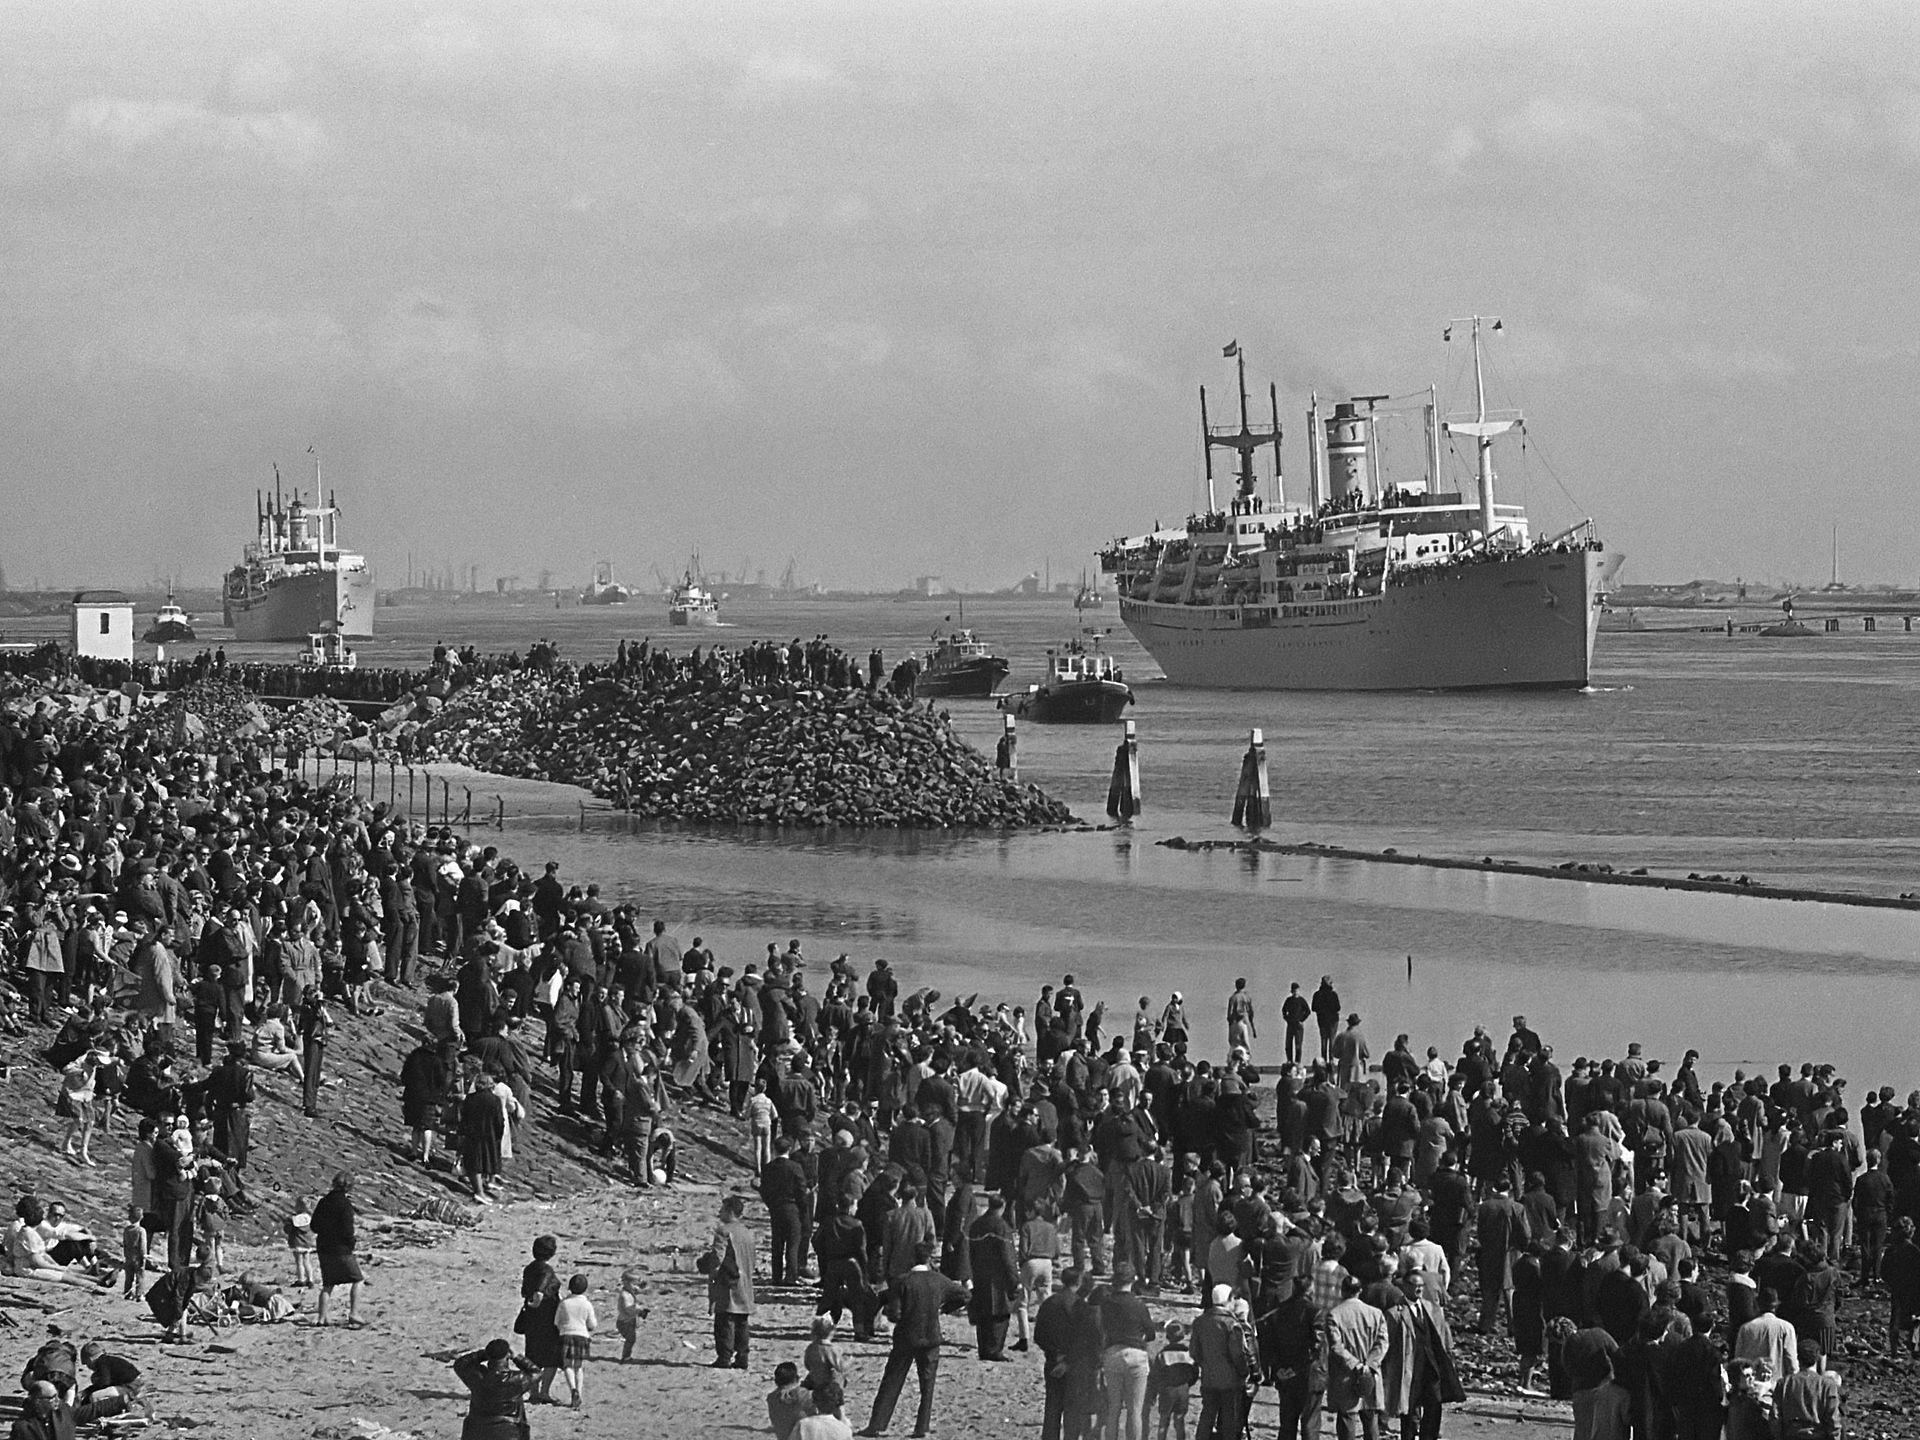 Holland-America Line ship theSS Waterman